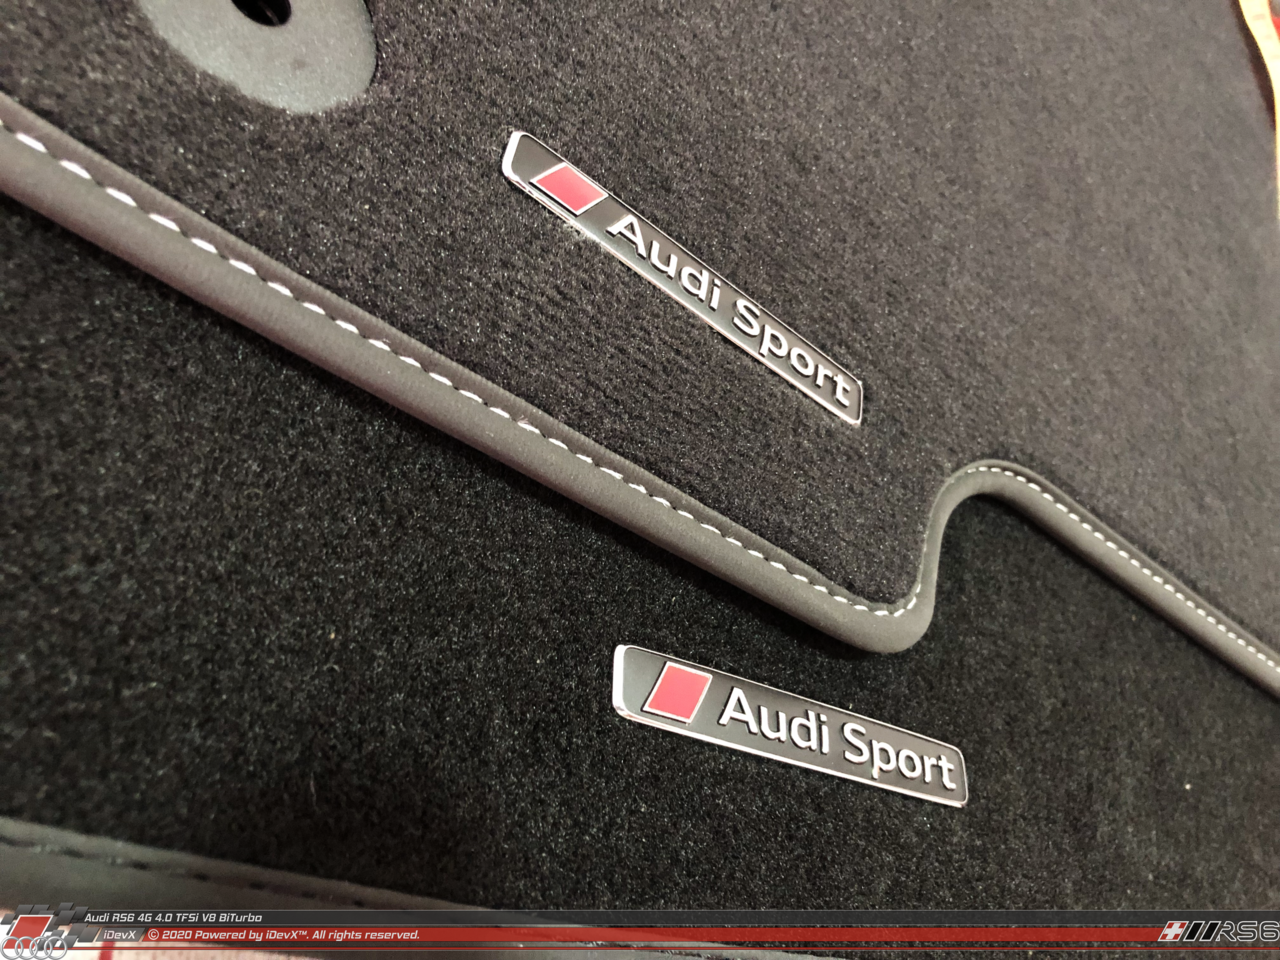 15_08.2019_Audi-RS6_iDevX_011.png